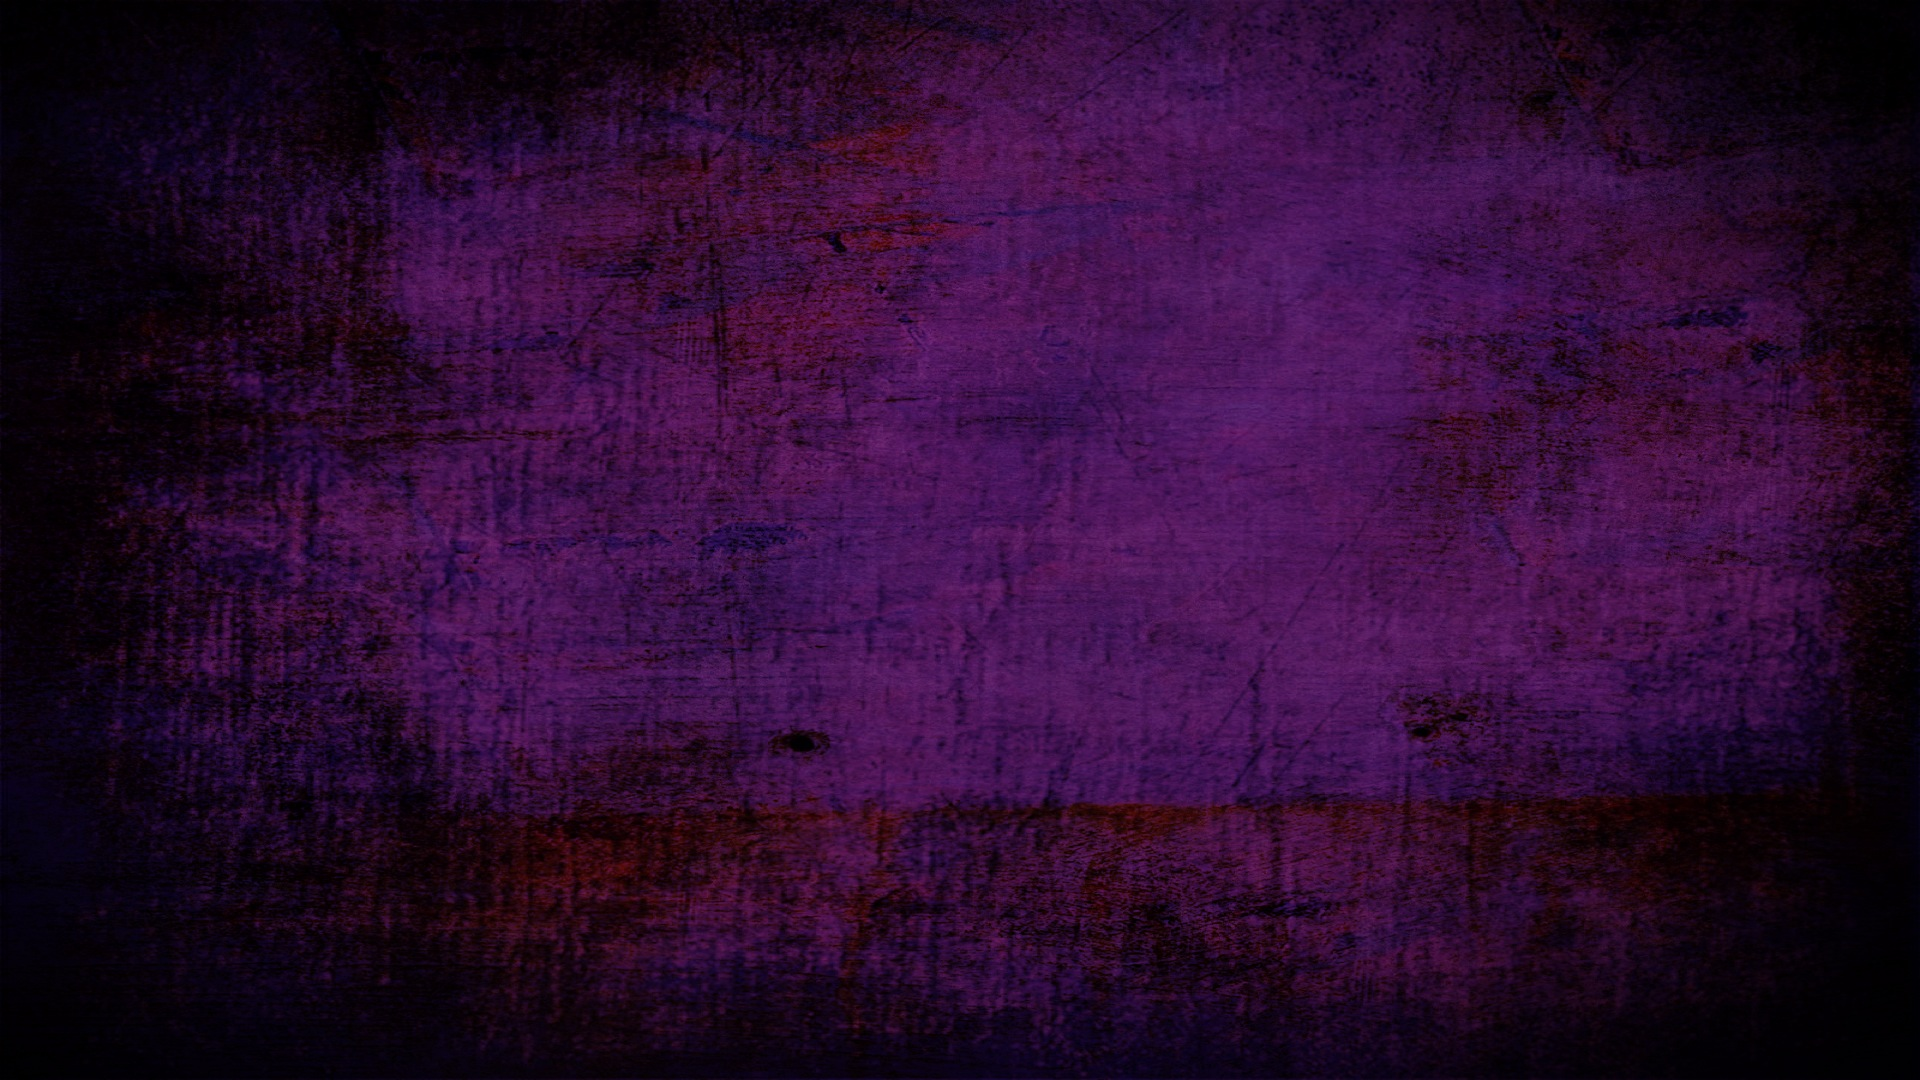 Dark Purple Batique Look Background Image 1920x1080